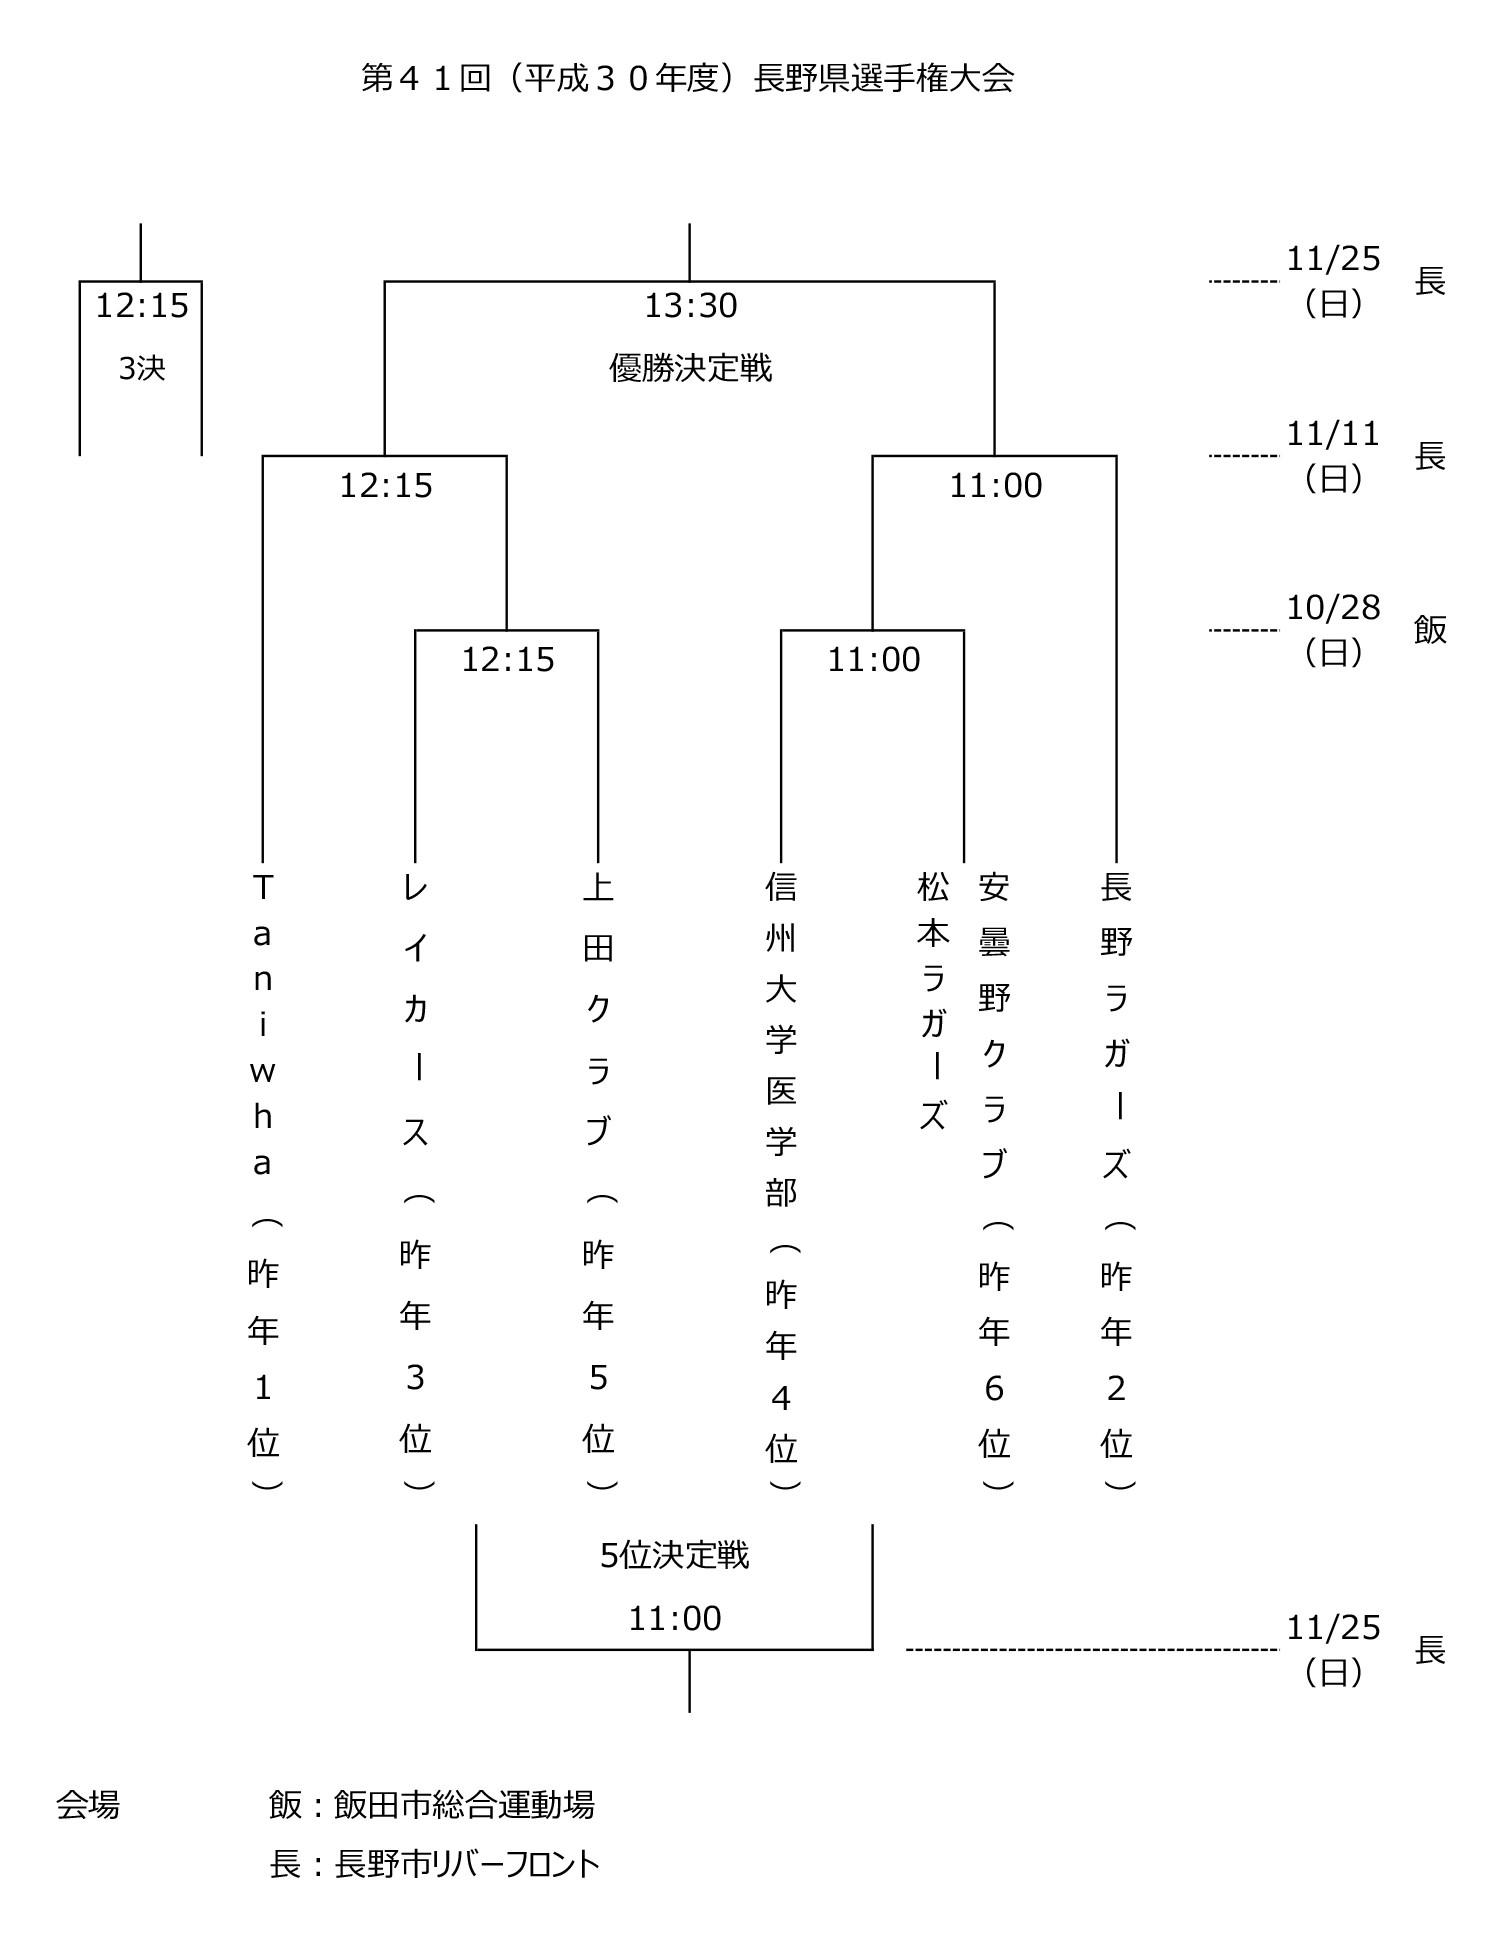 41th-Nagano-Championship.jpg